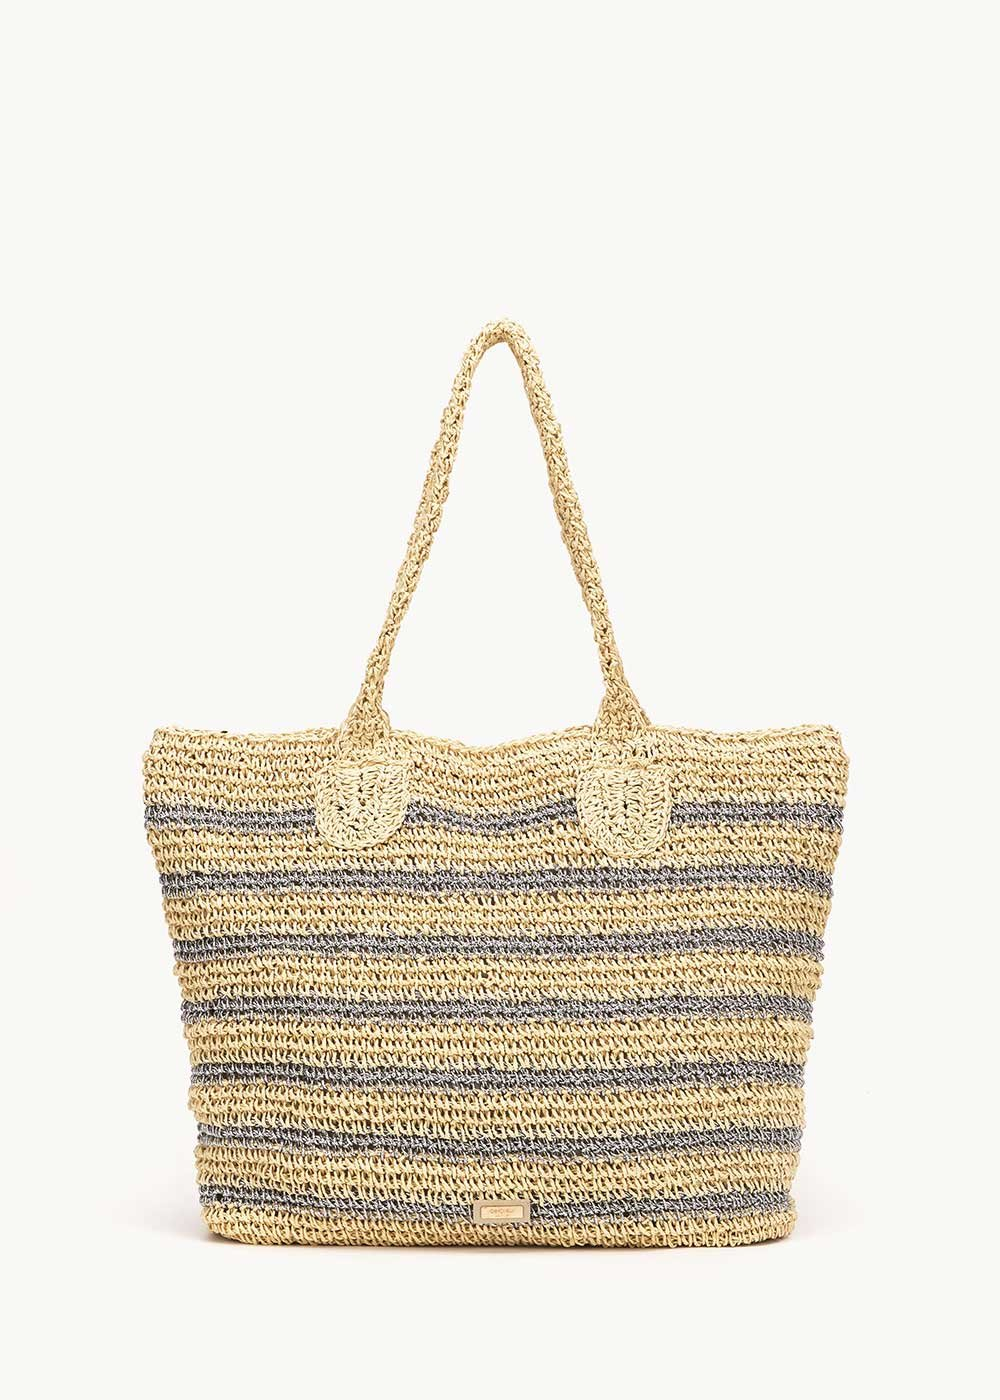 Bady straw shopping bag - Light Beige / Silver - Woman